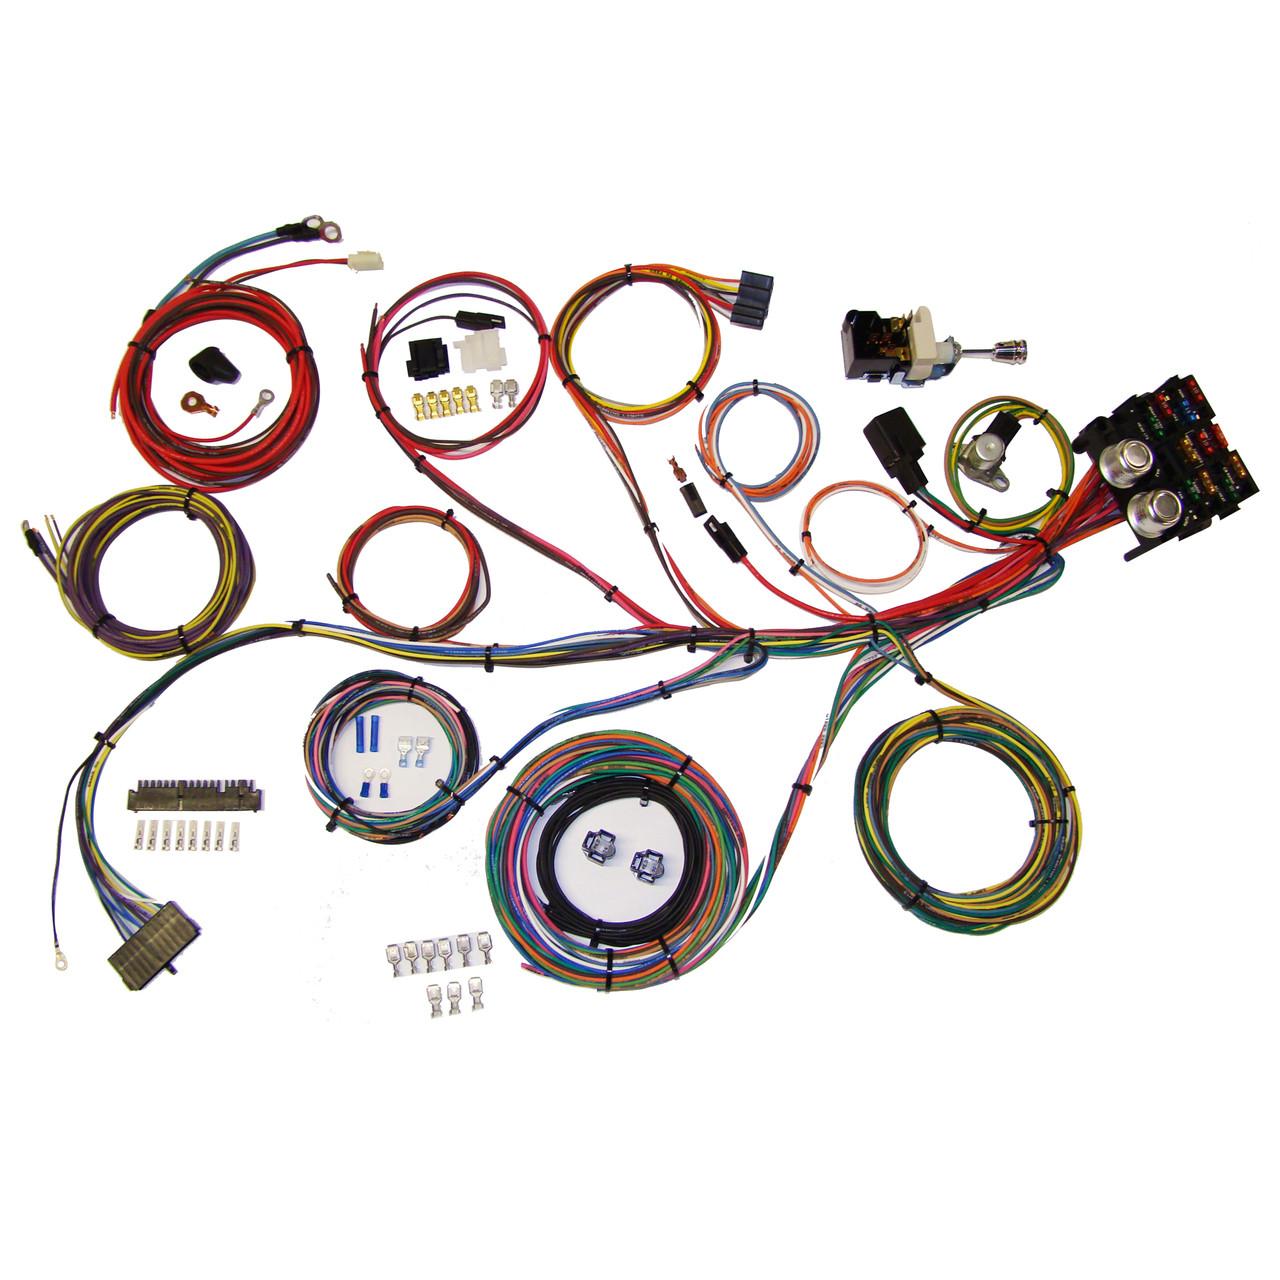 autowire builder 19 kit 510006 street rod hot universal wiring autowire builder 19 kit 510006 street rod hot universal wiring harness [ 1280 x 1280 Pixel ]